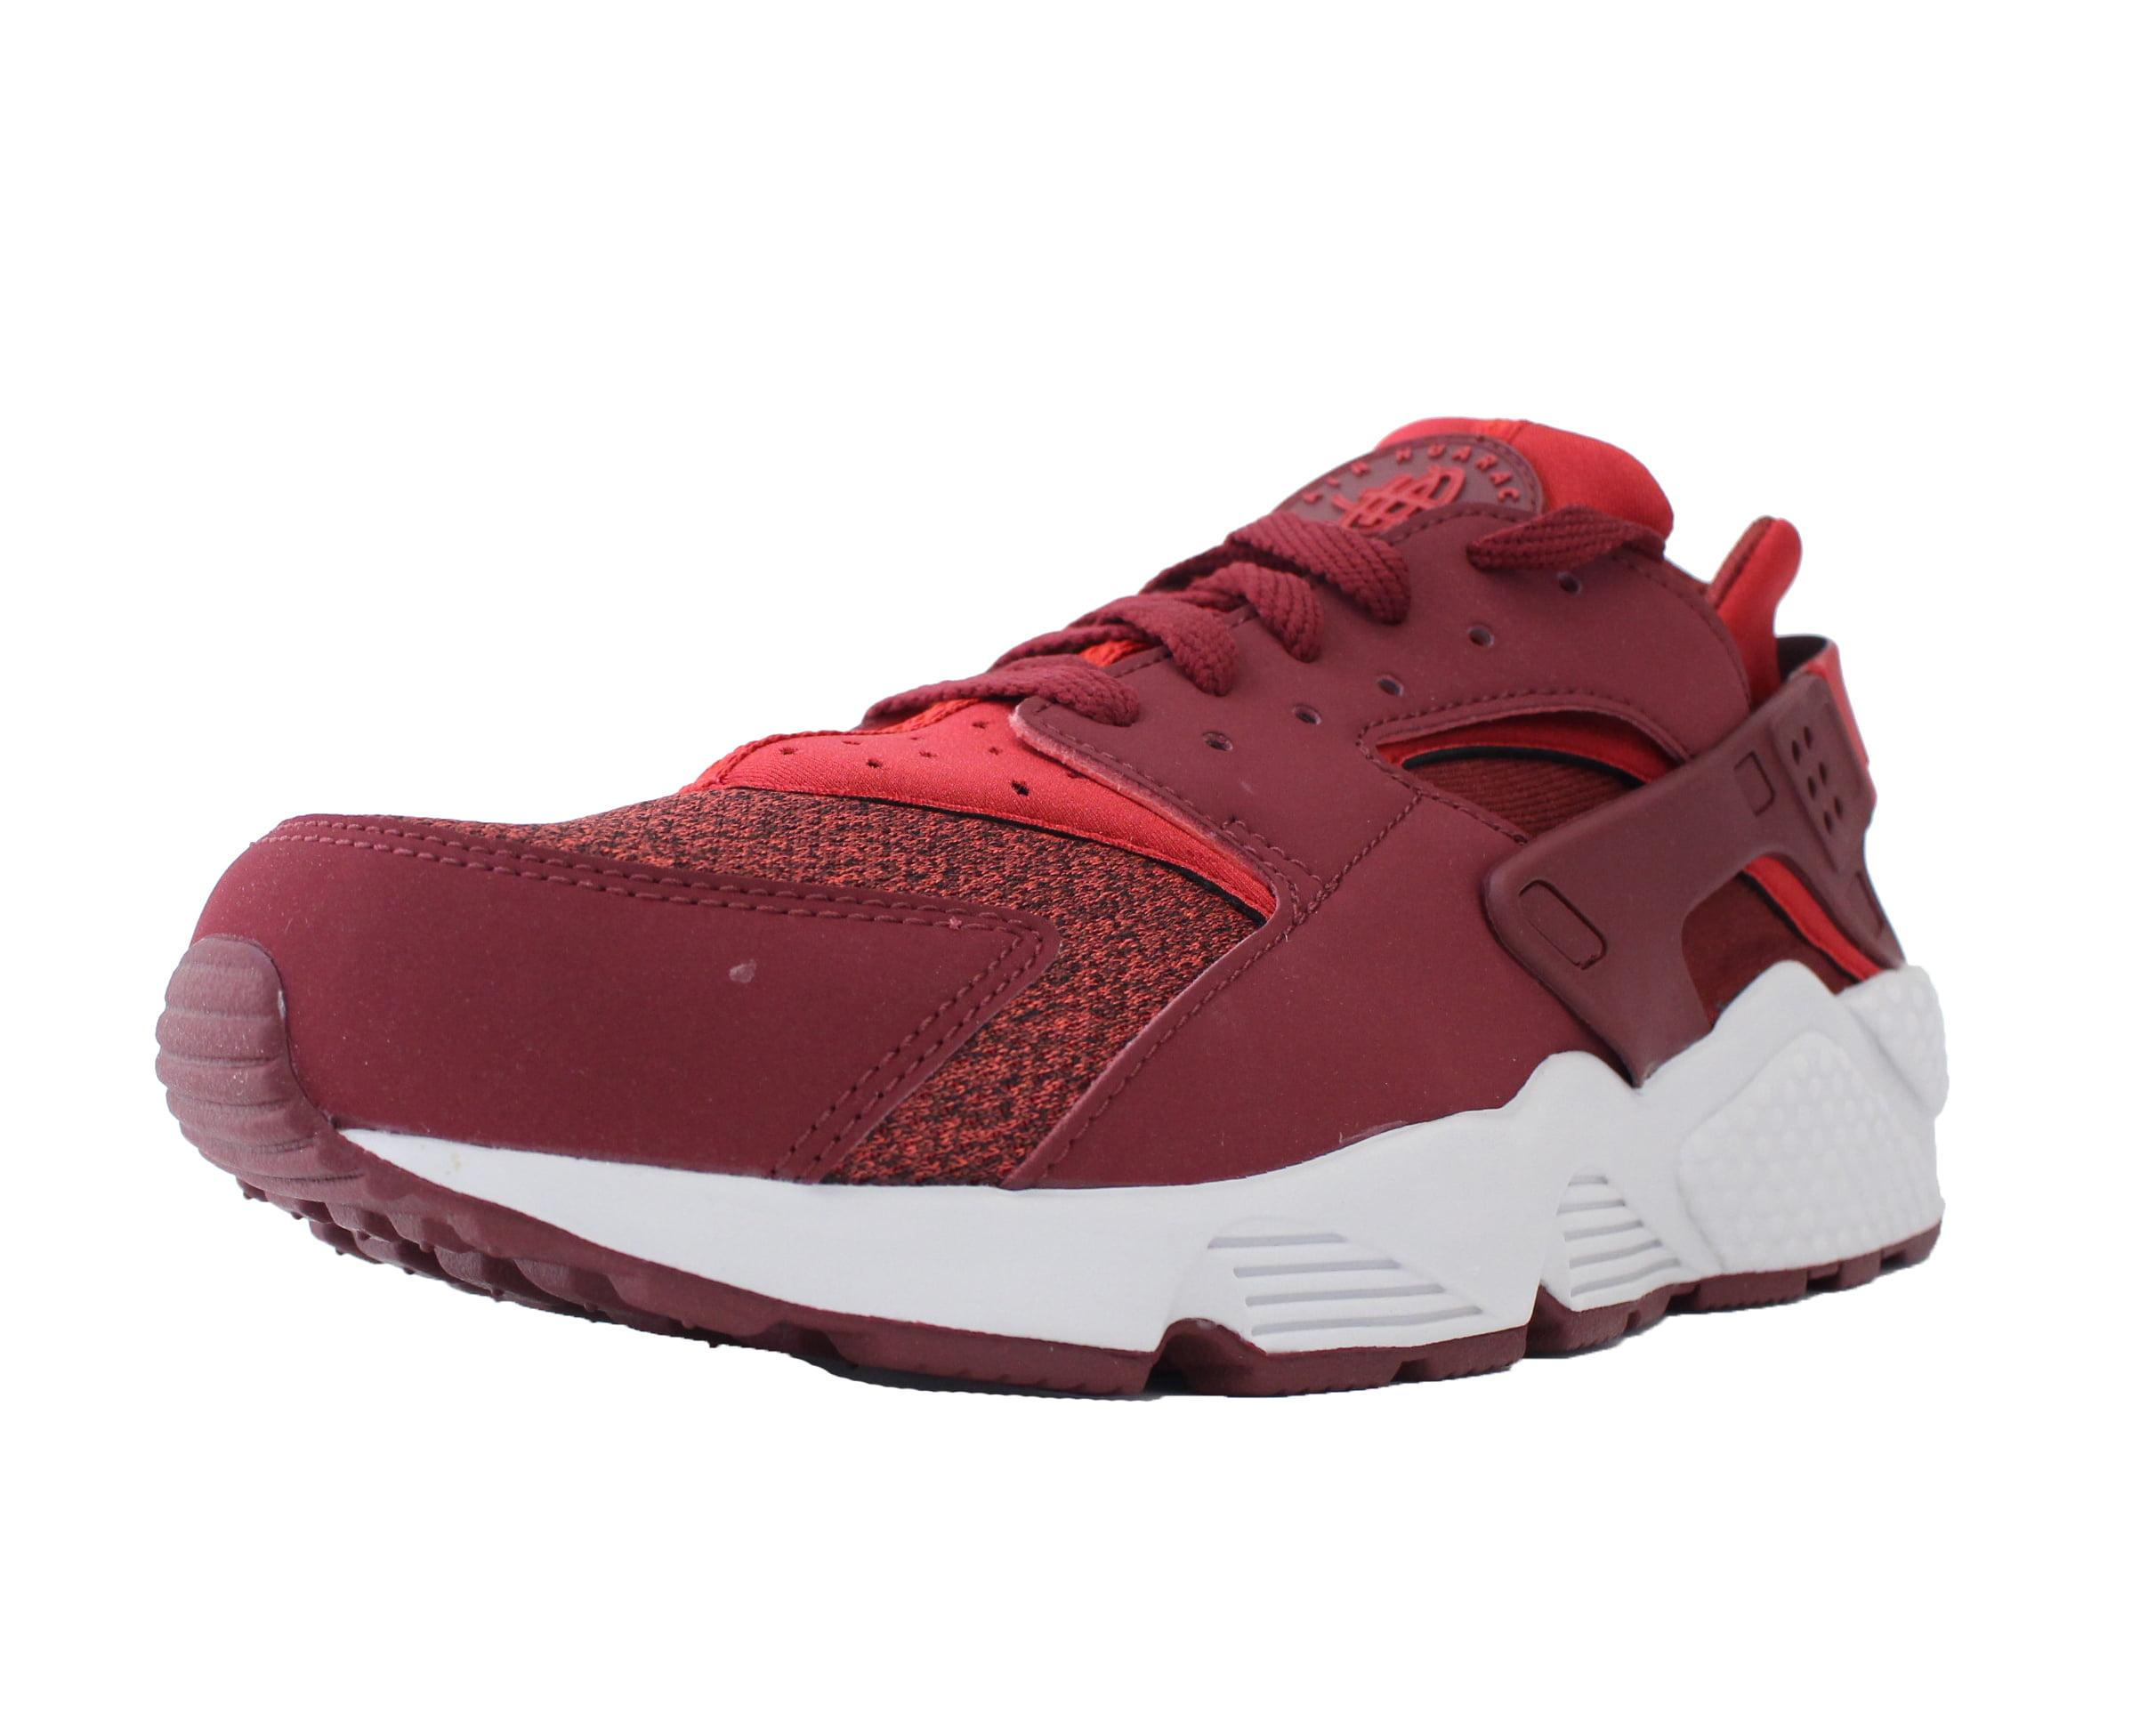 sale retailer ed52d fd2e8 ... australia nike air huarache run sz 9.5 university team red running shoes  a8de8 91cb9